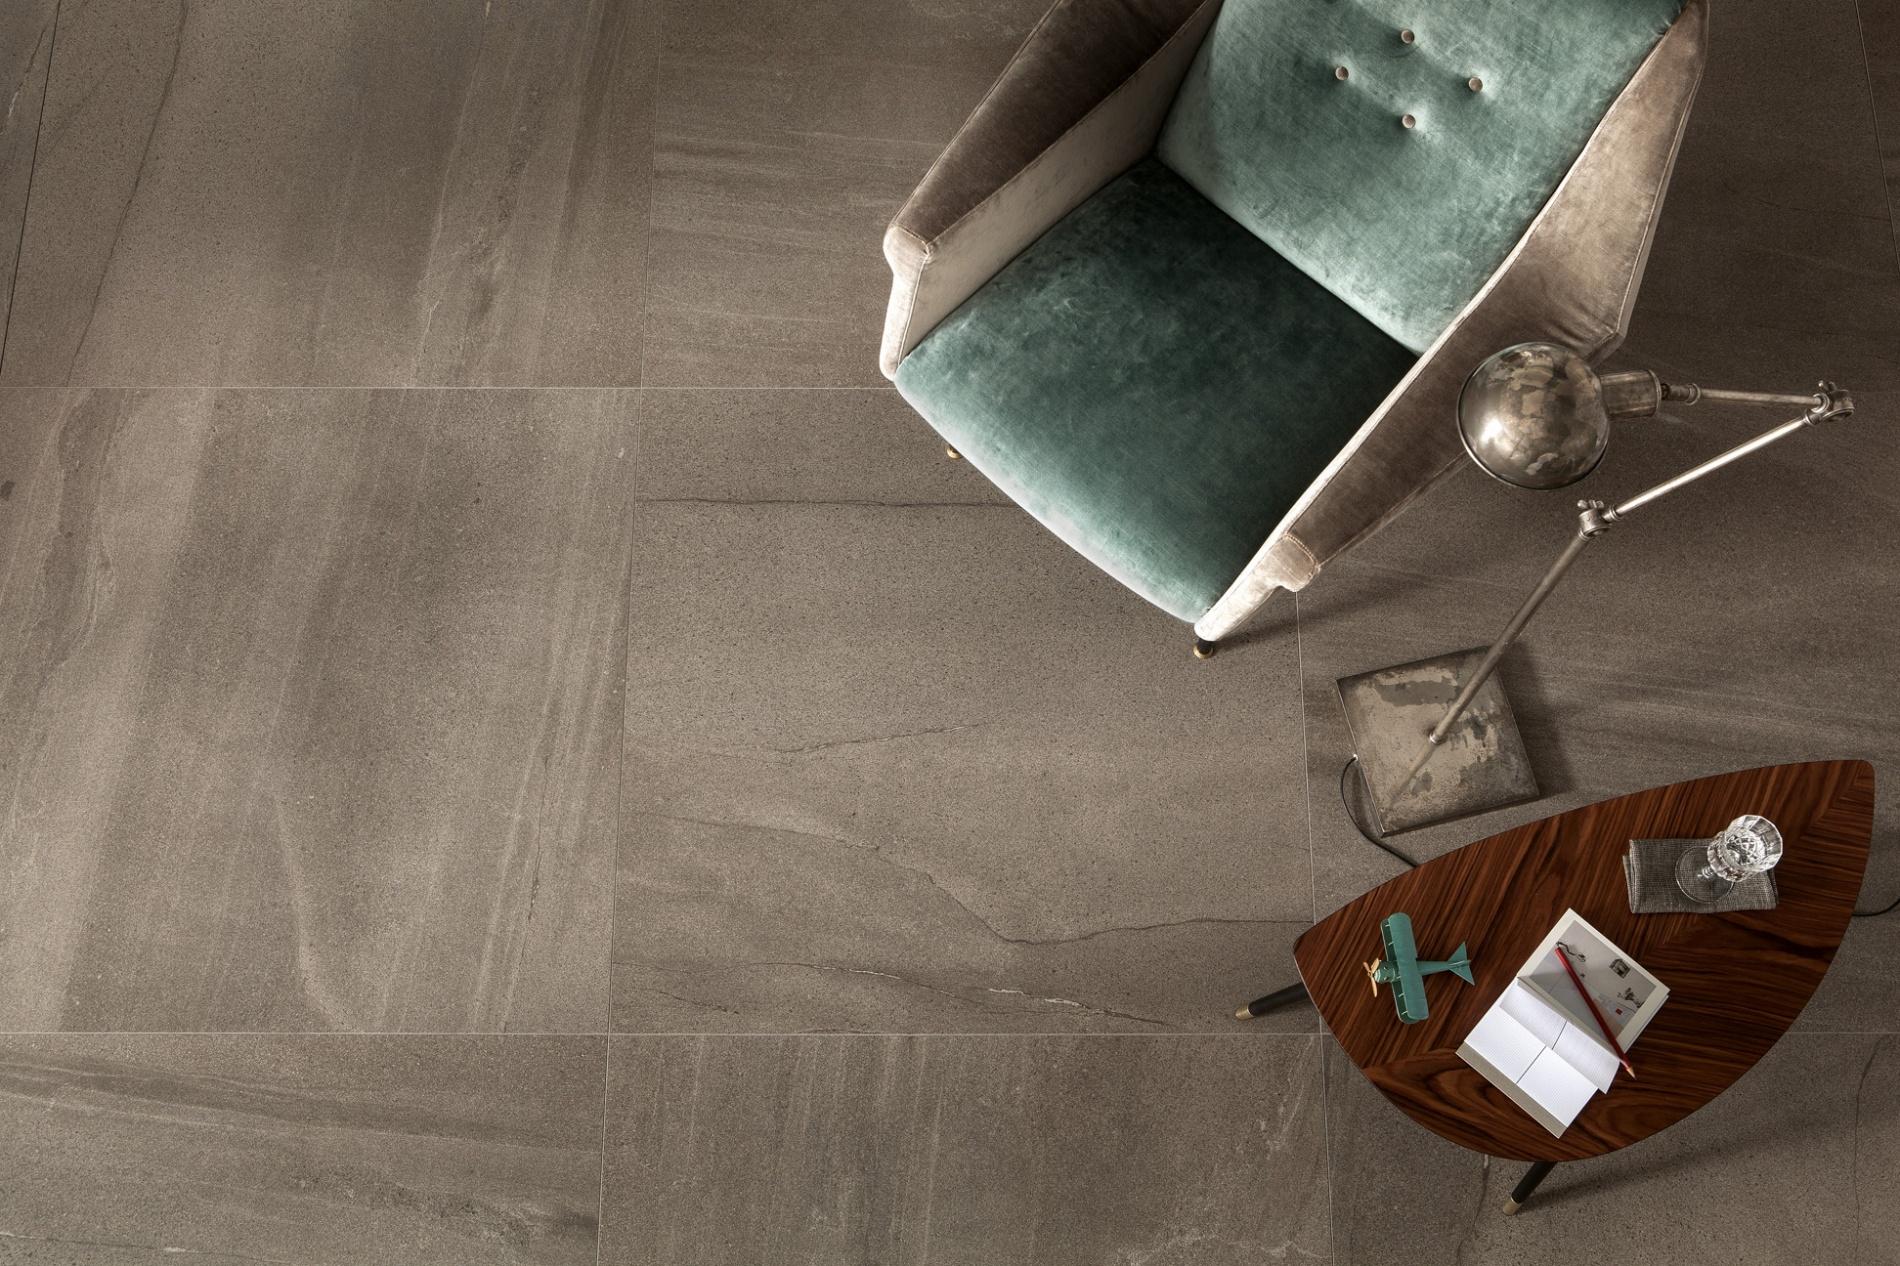 porcelain tile images: Basalt Stone range high quality photo